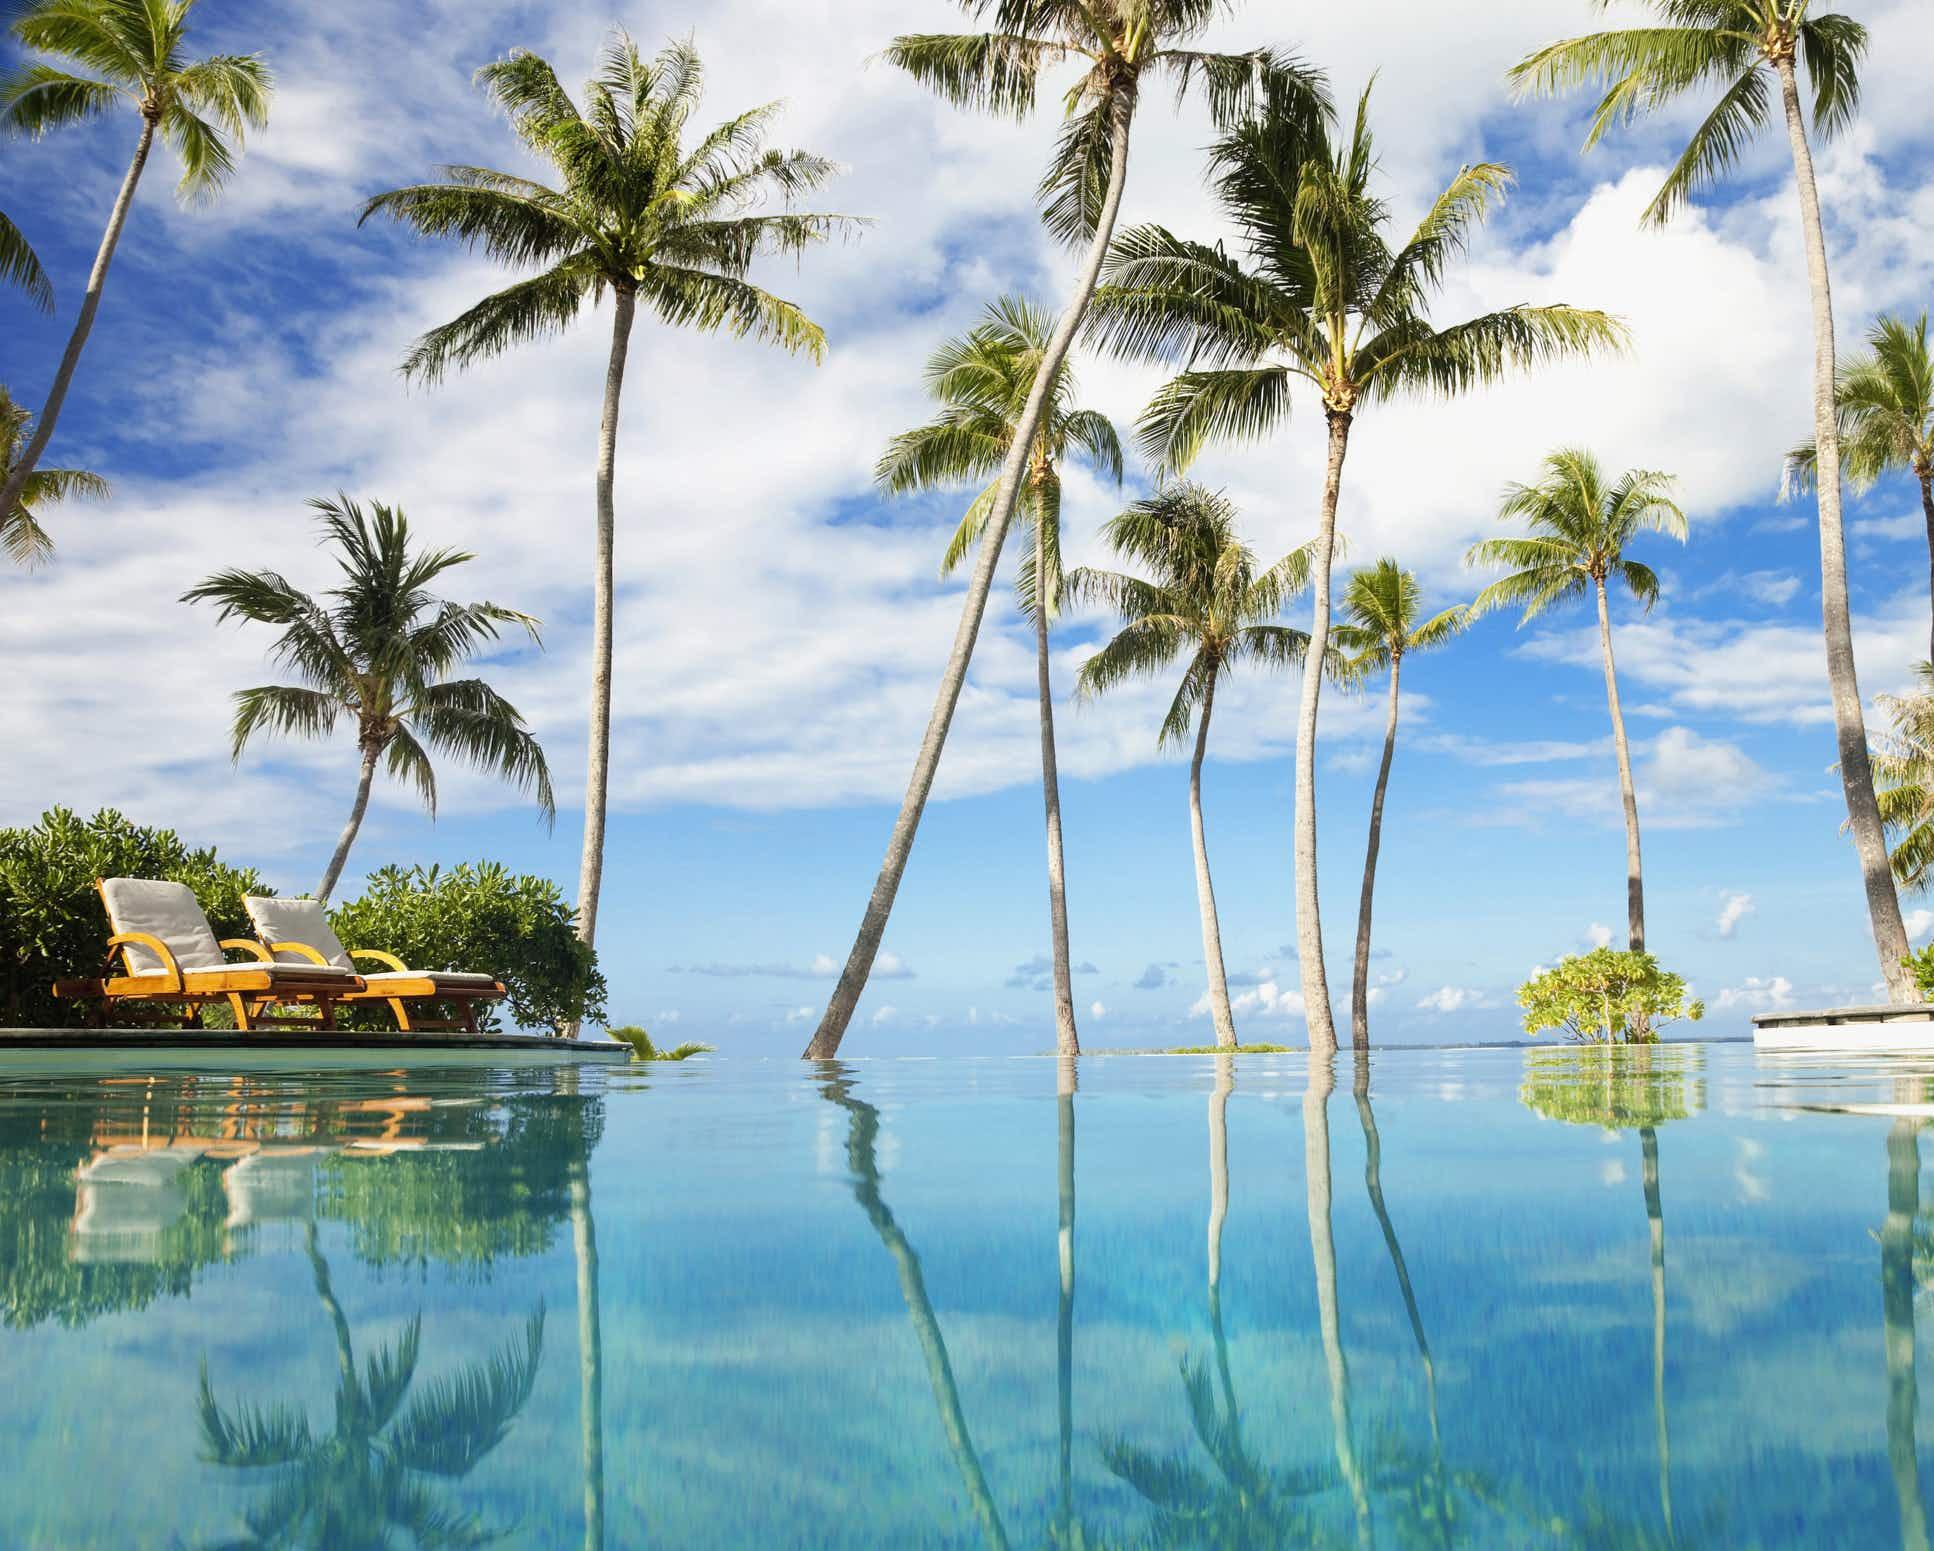 New direct flights connect mainland USA to the island of Tahiti